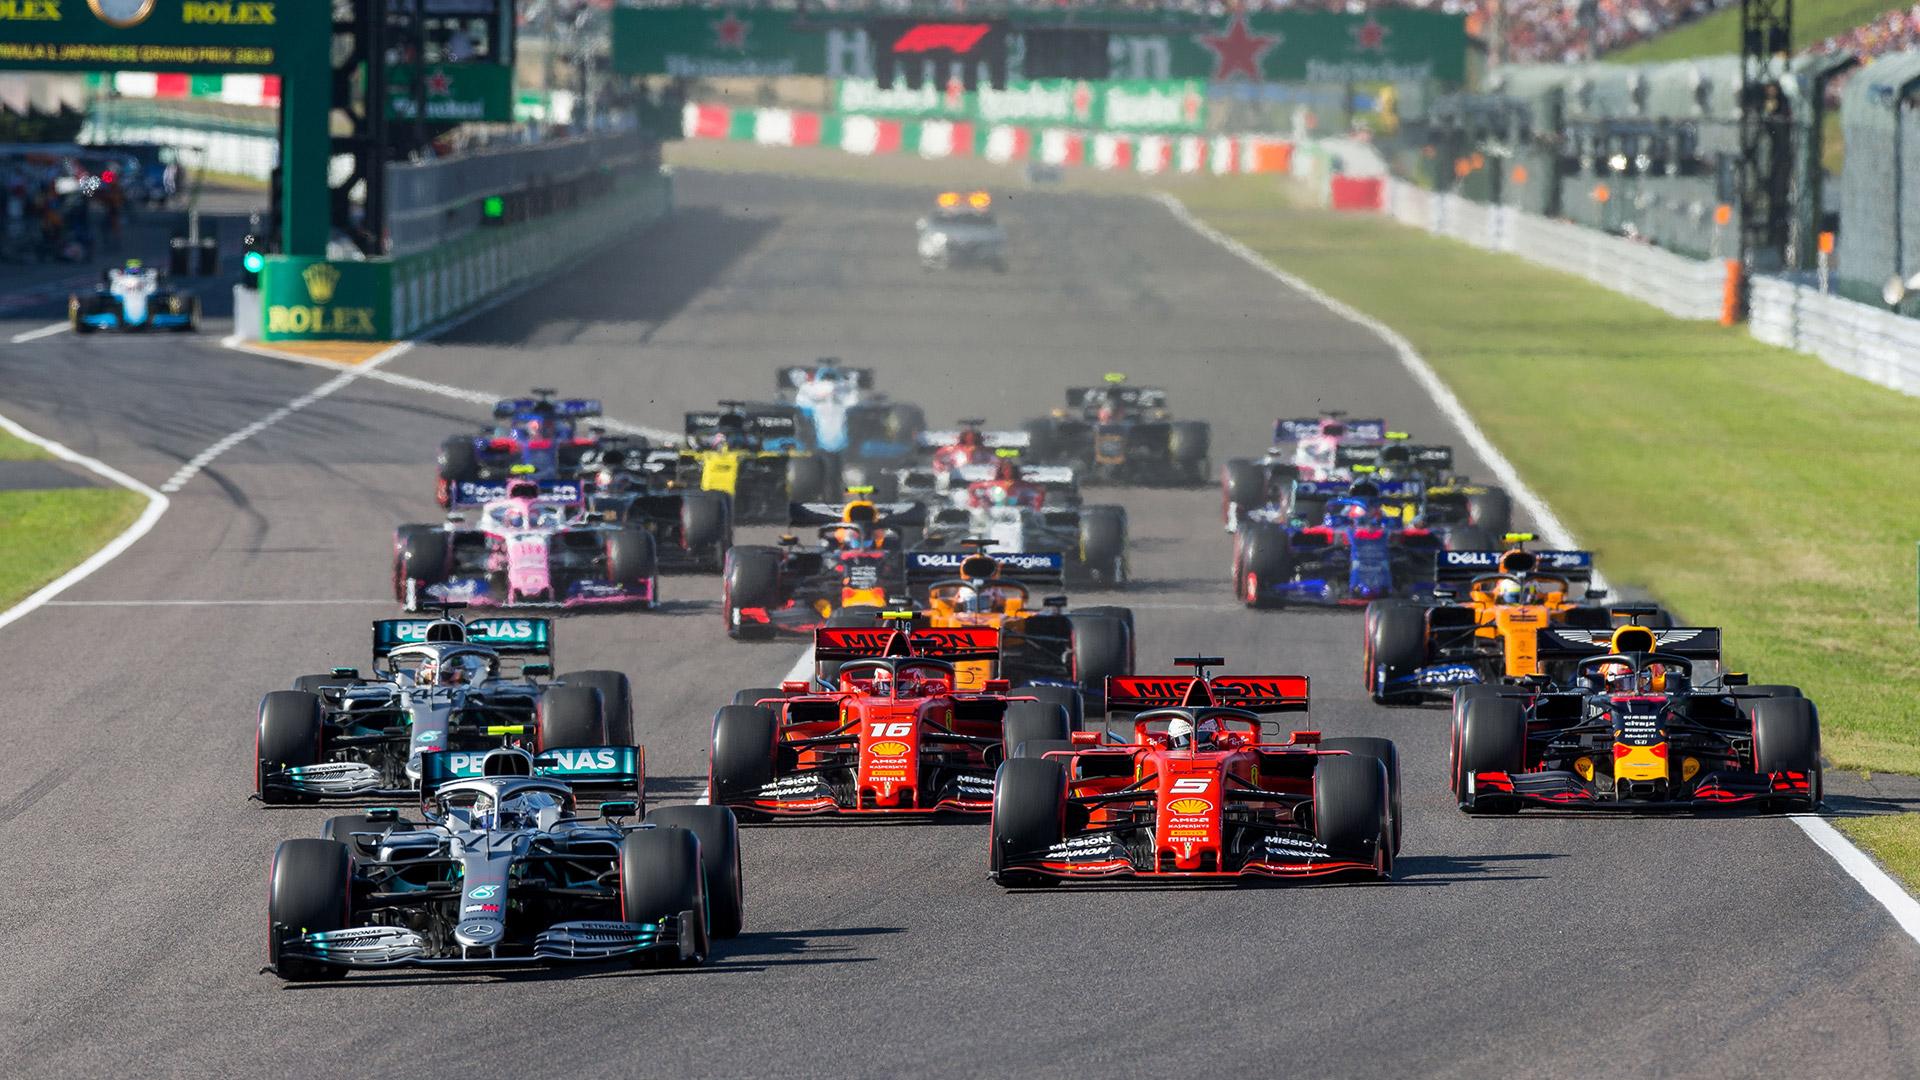 Equipos de Fórmula 1 fabrican respiradores para contagiados de Covid-19